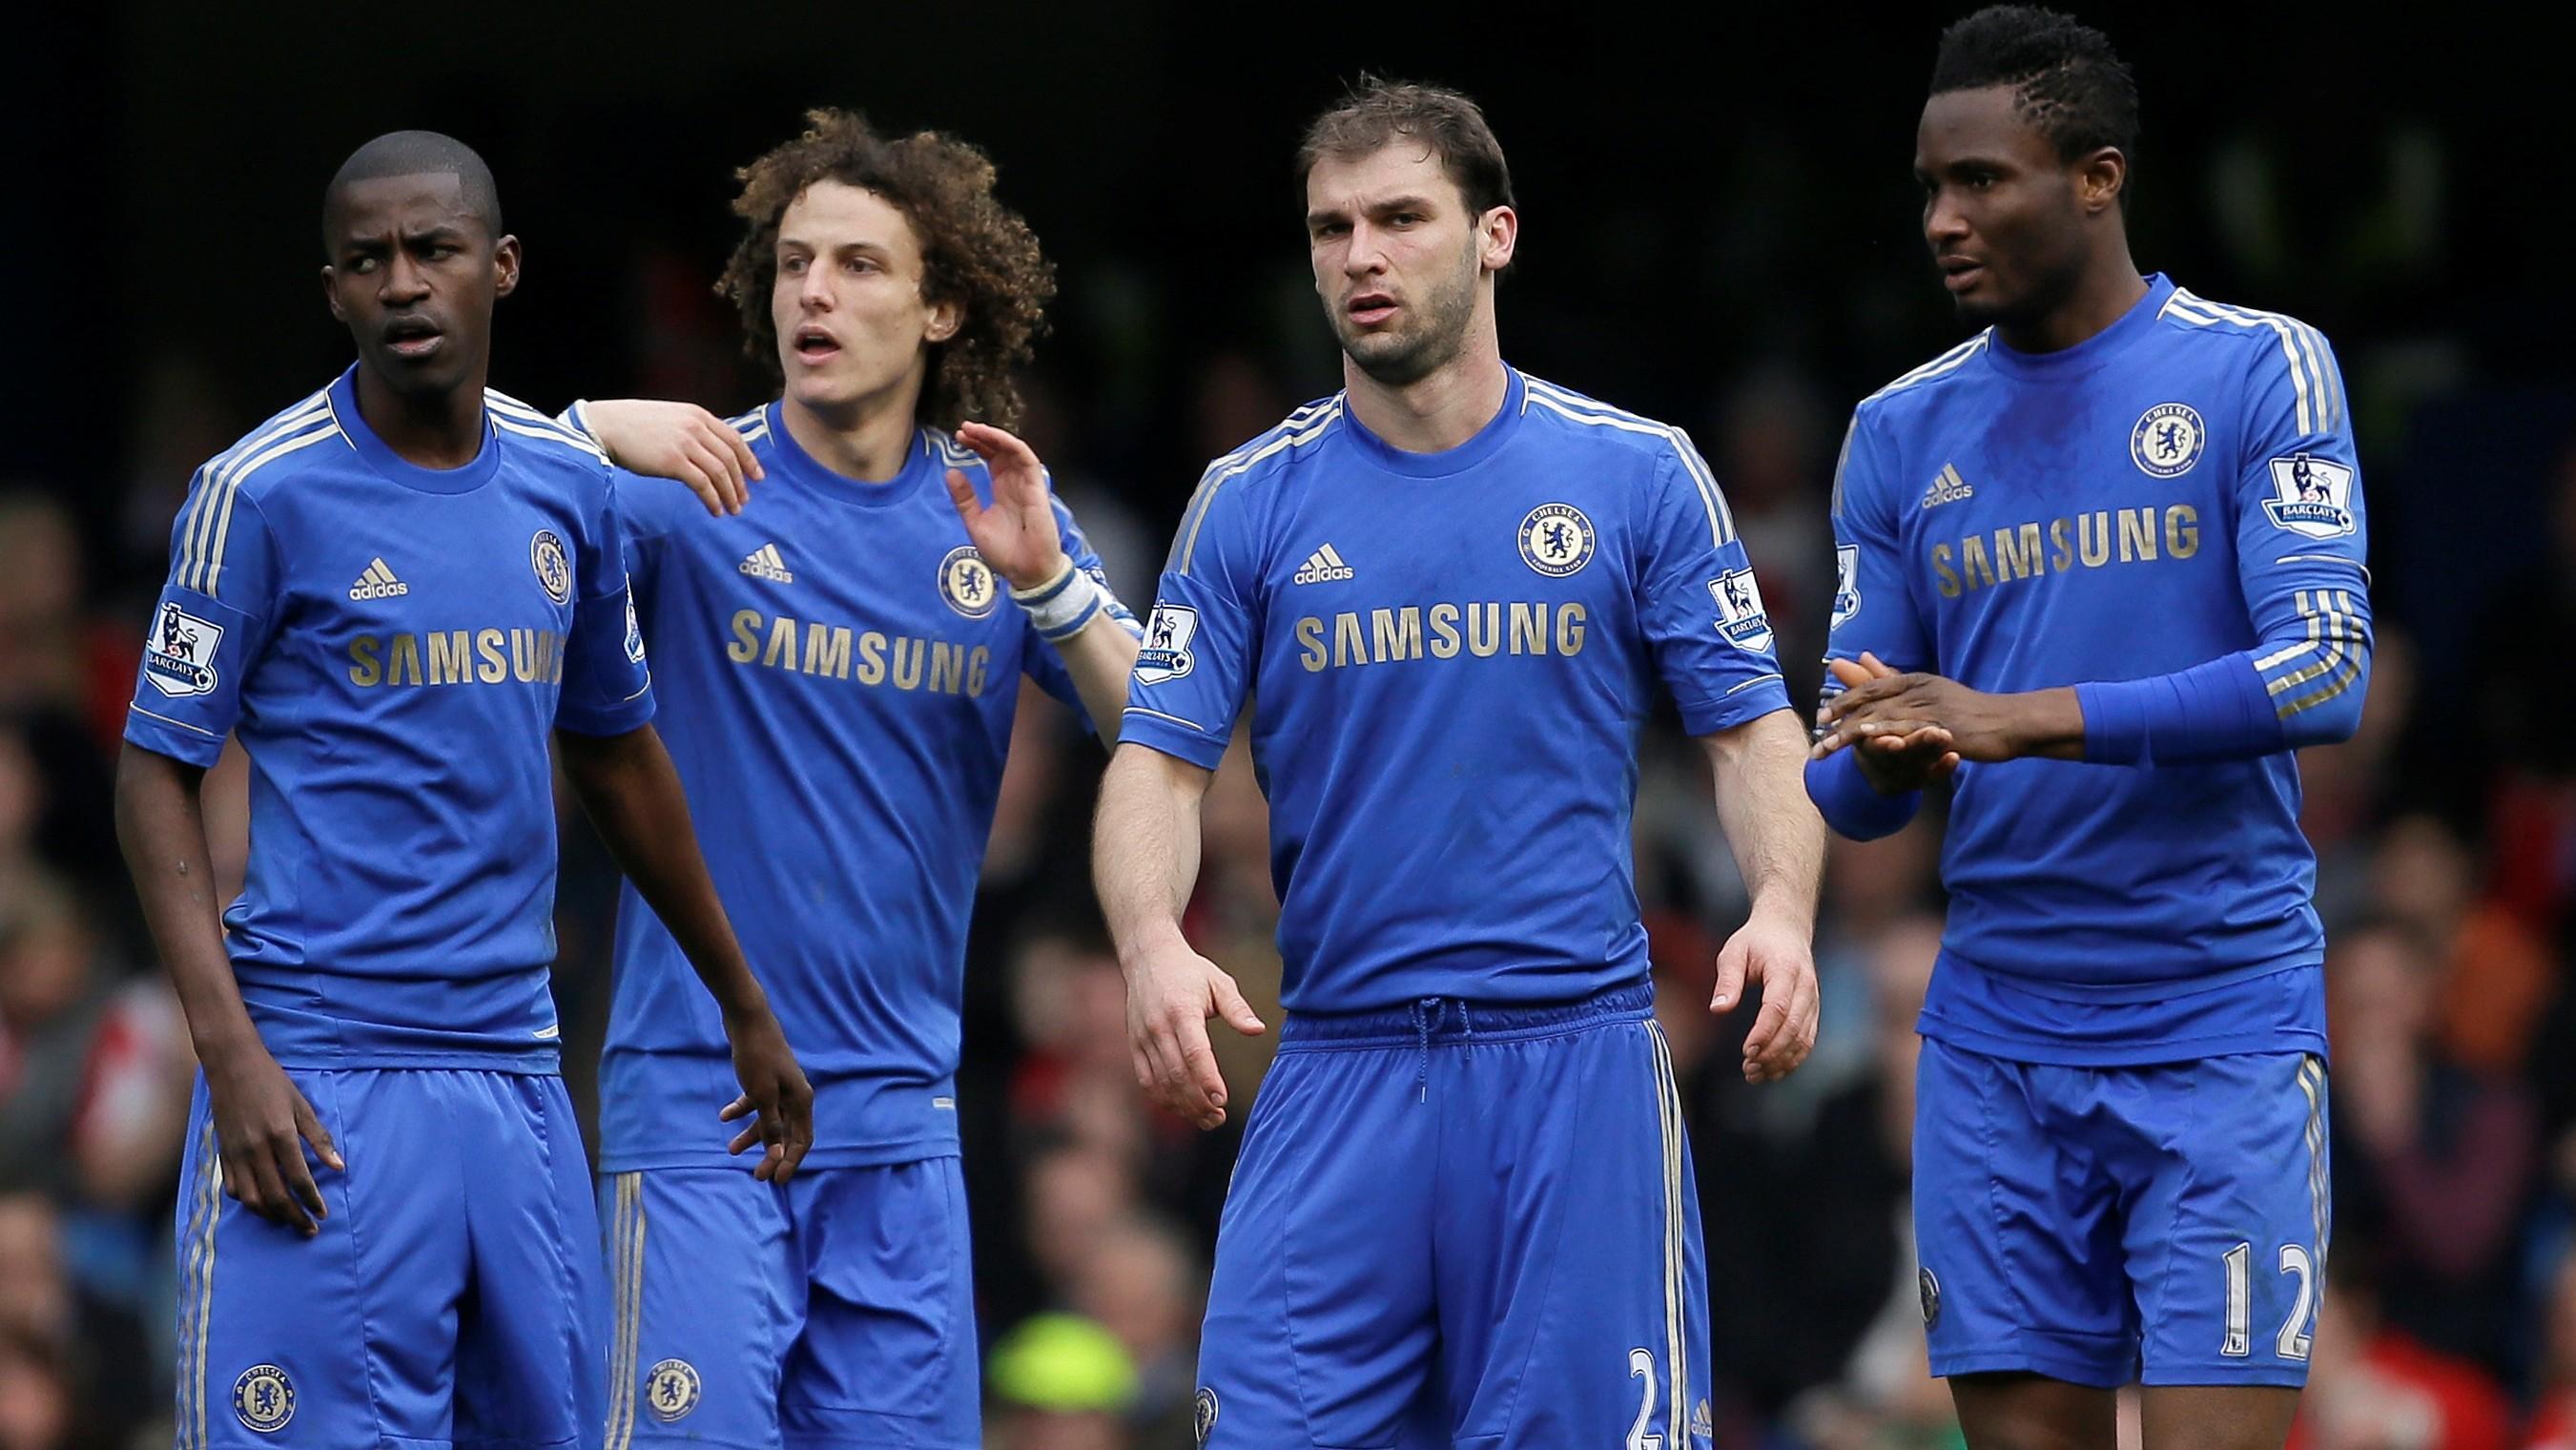 19f636f257 Chelsea embala em maratona de jogos e recupera 3º lugar